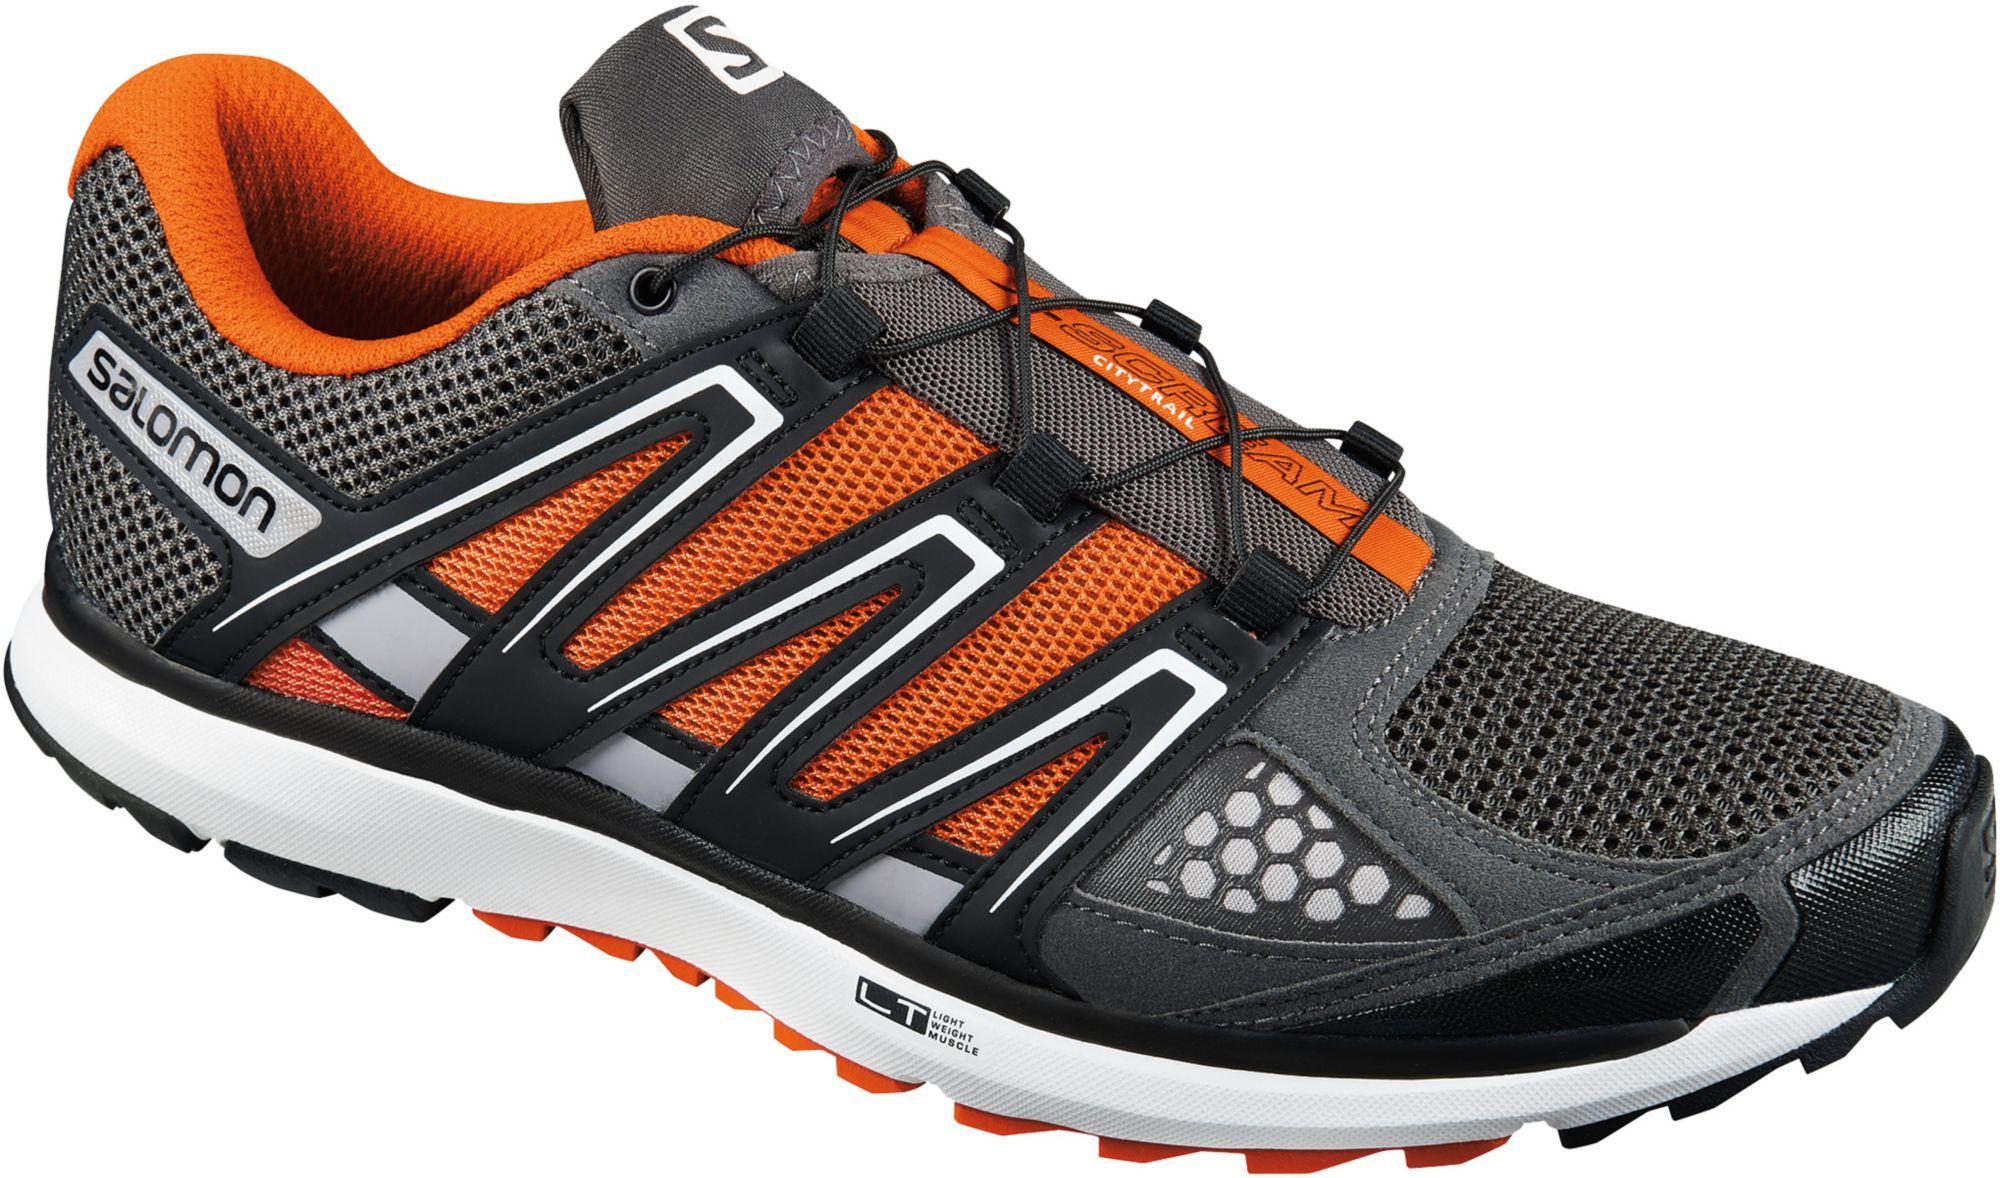 Salomon Men S X Scream Ragnar Trail Running Shoes Running Shoes Trail Running Shoes Shoes Mens